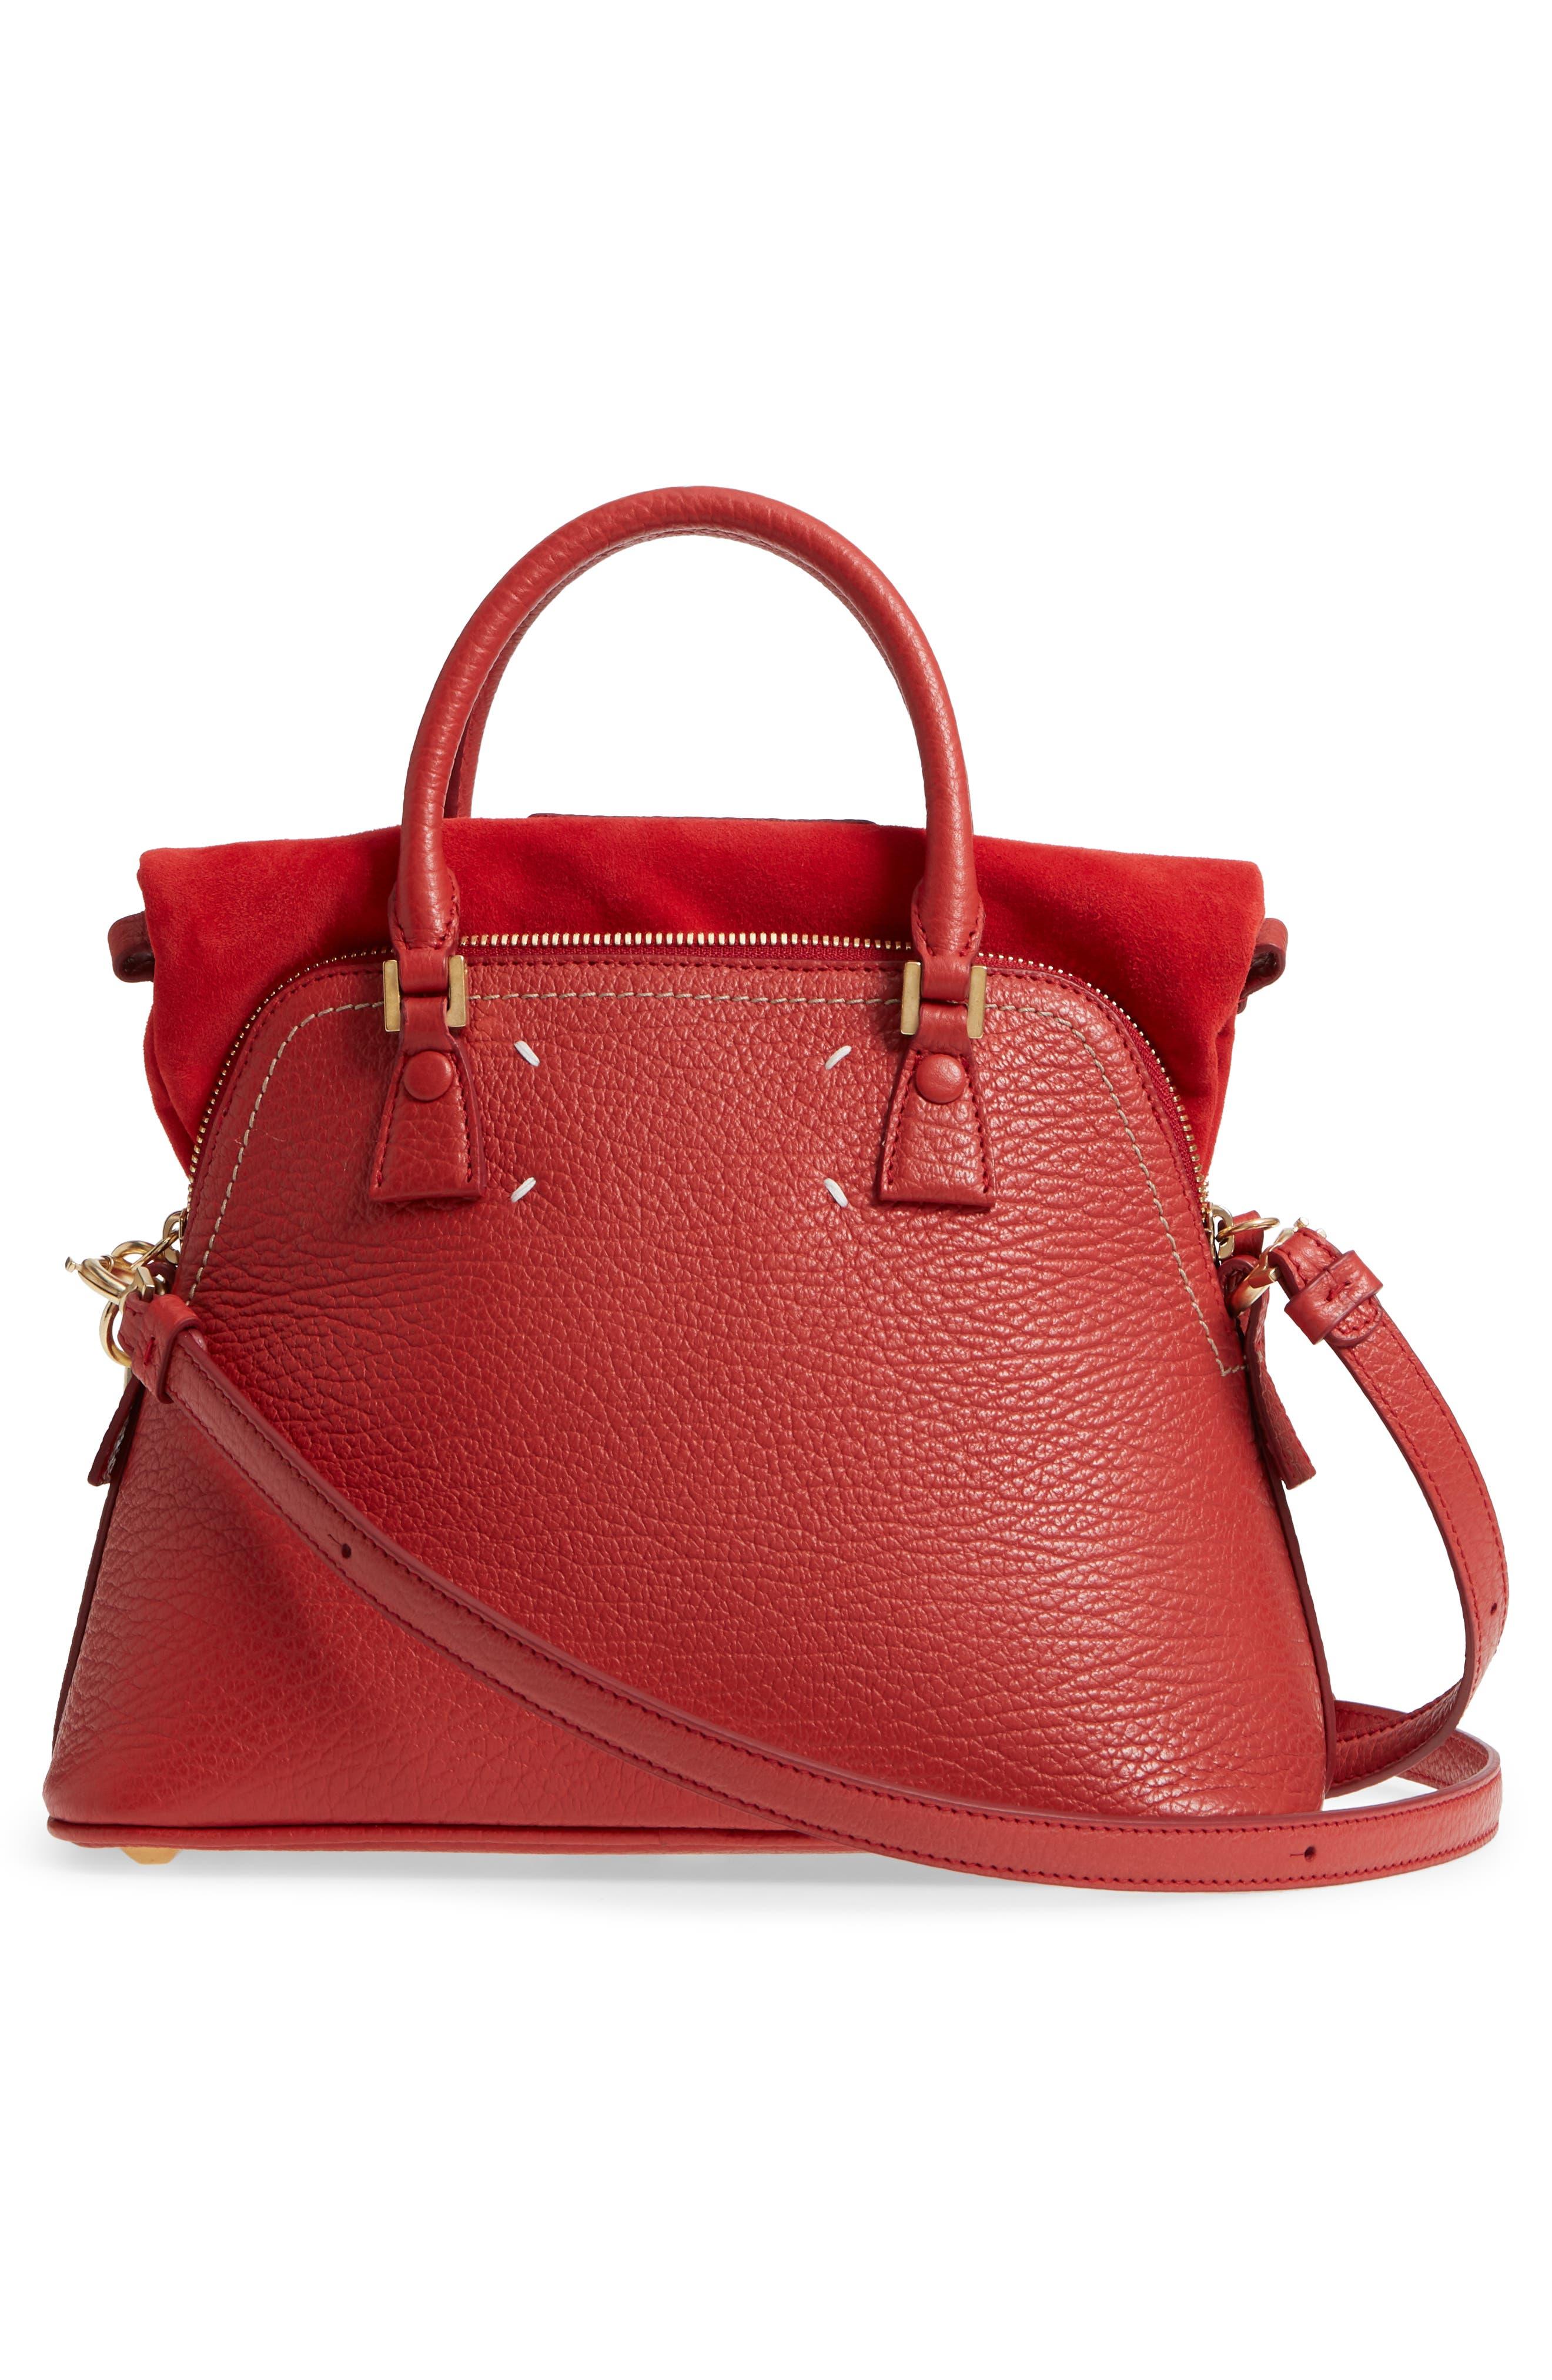 Small 5AC Calfskin Leather Handbag,                             Alternate thumbnail 4, color,                             600